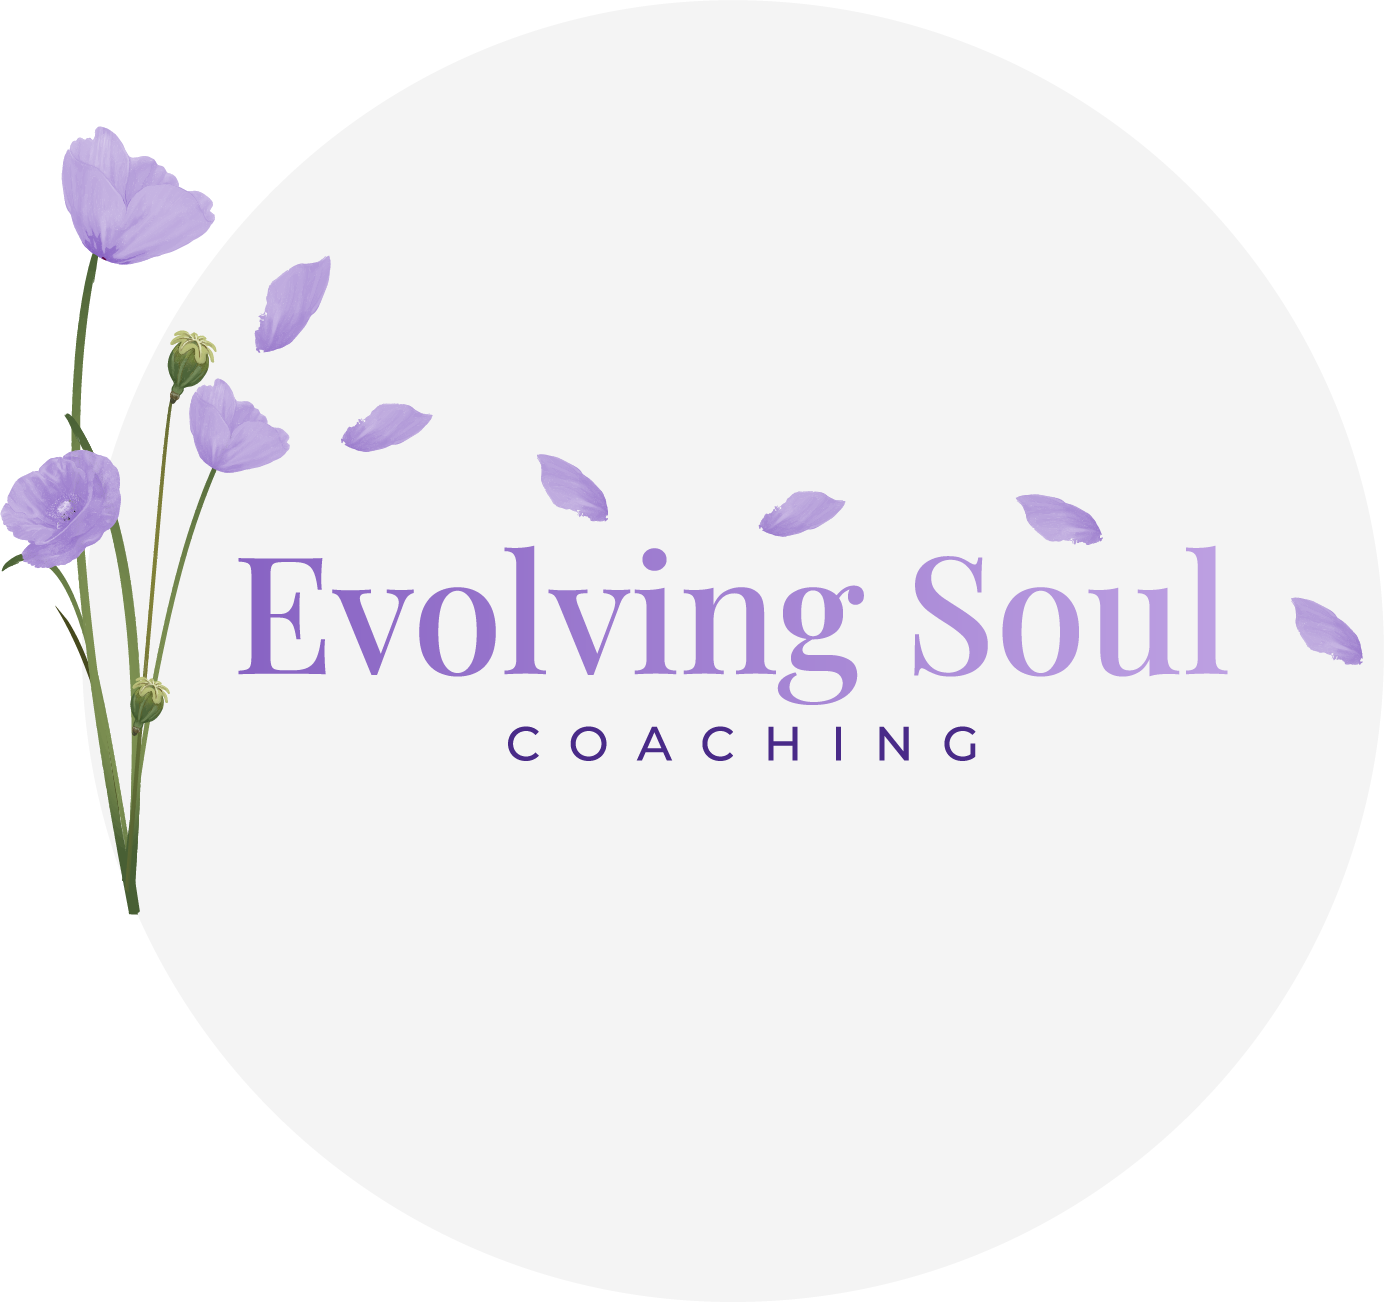 Evolving Soul Coaching